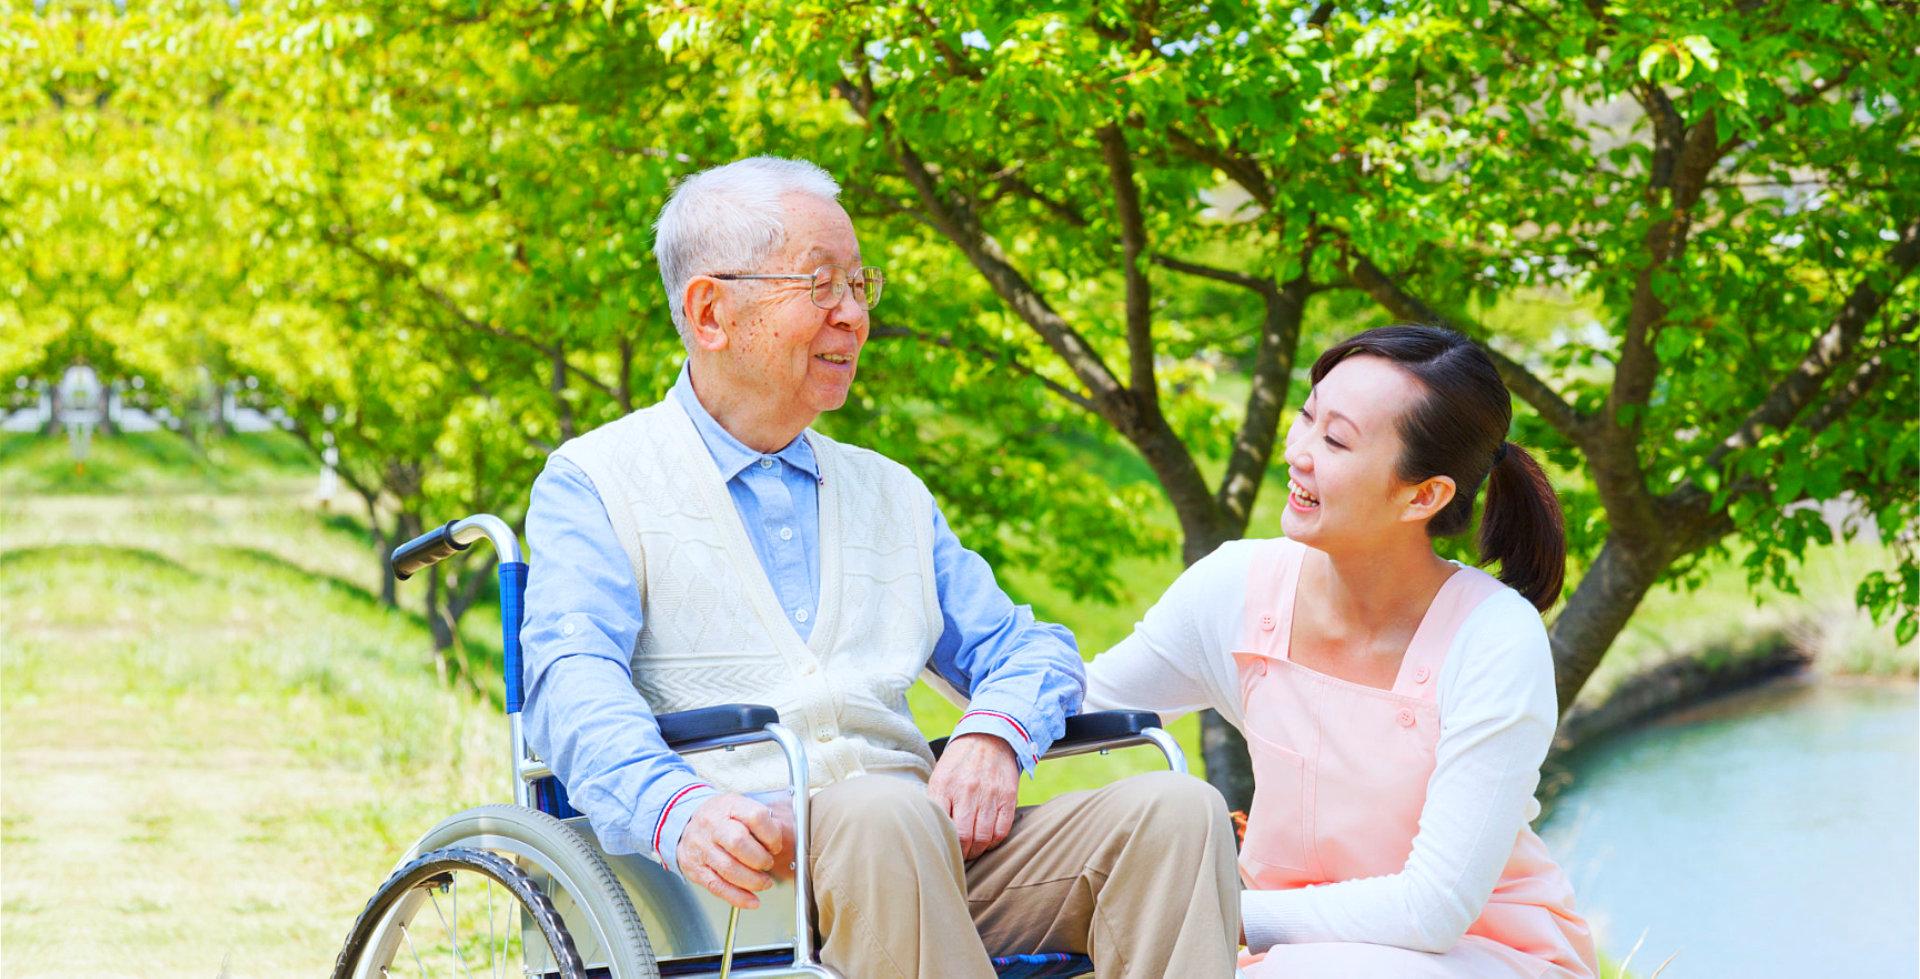 elder man with caregiver at the park